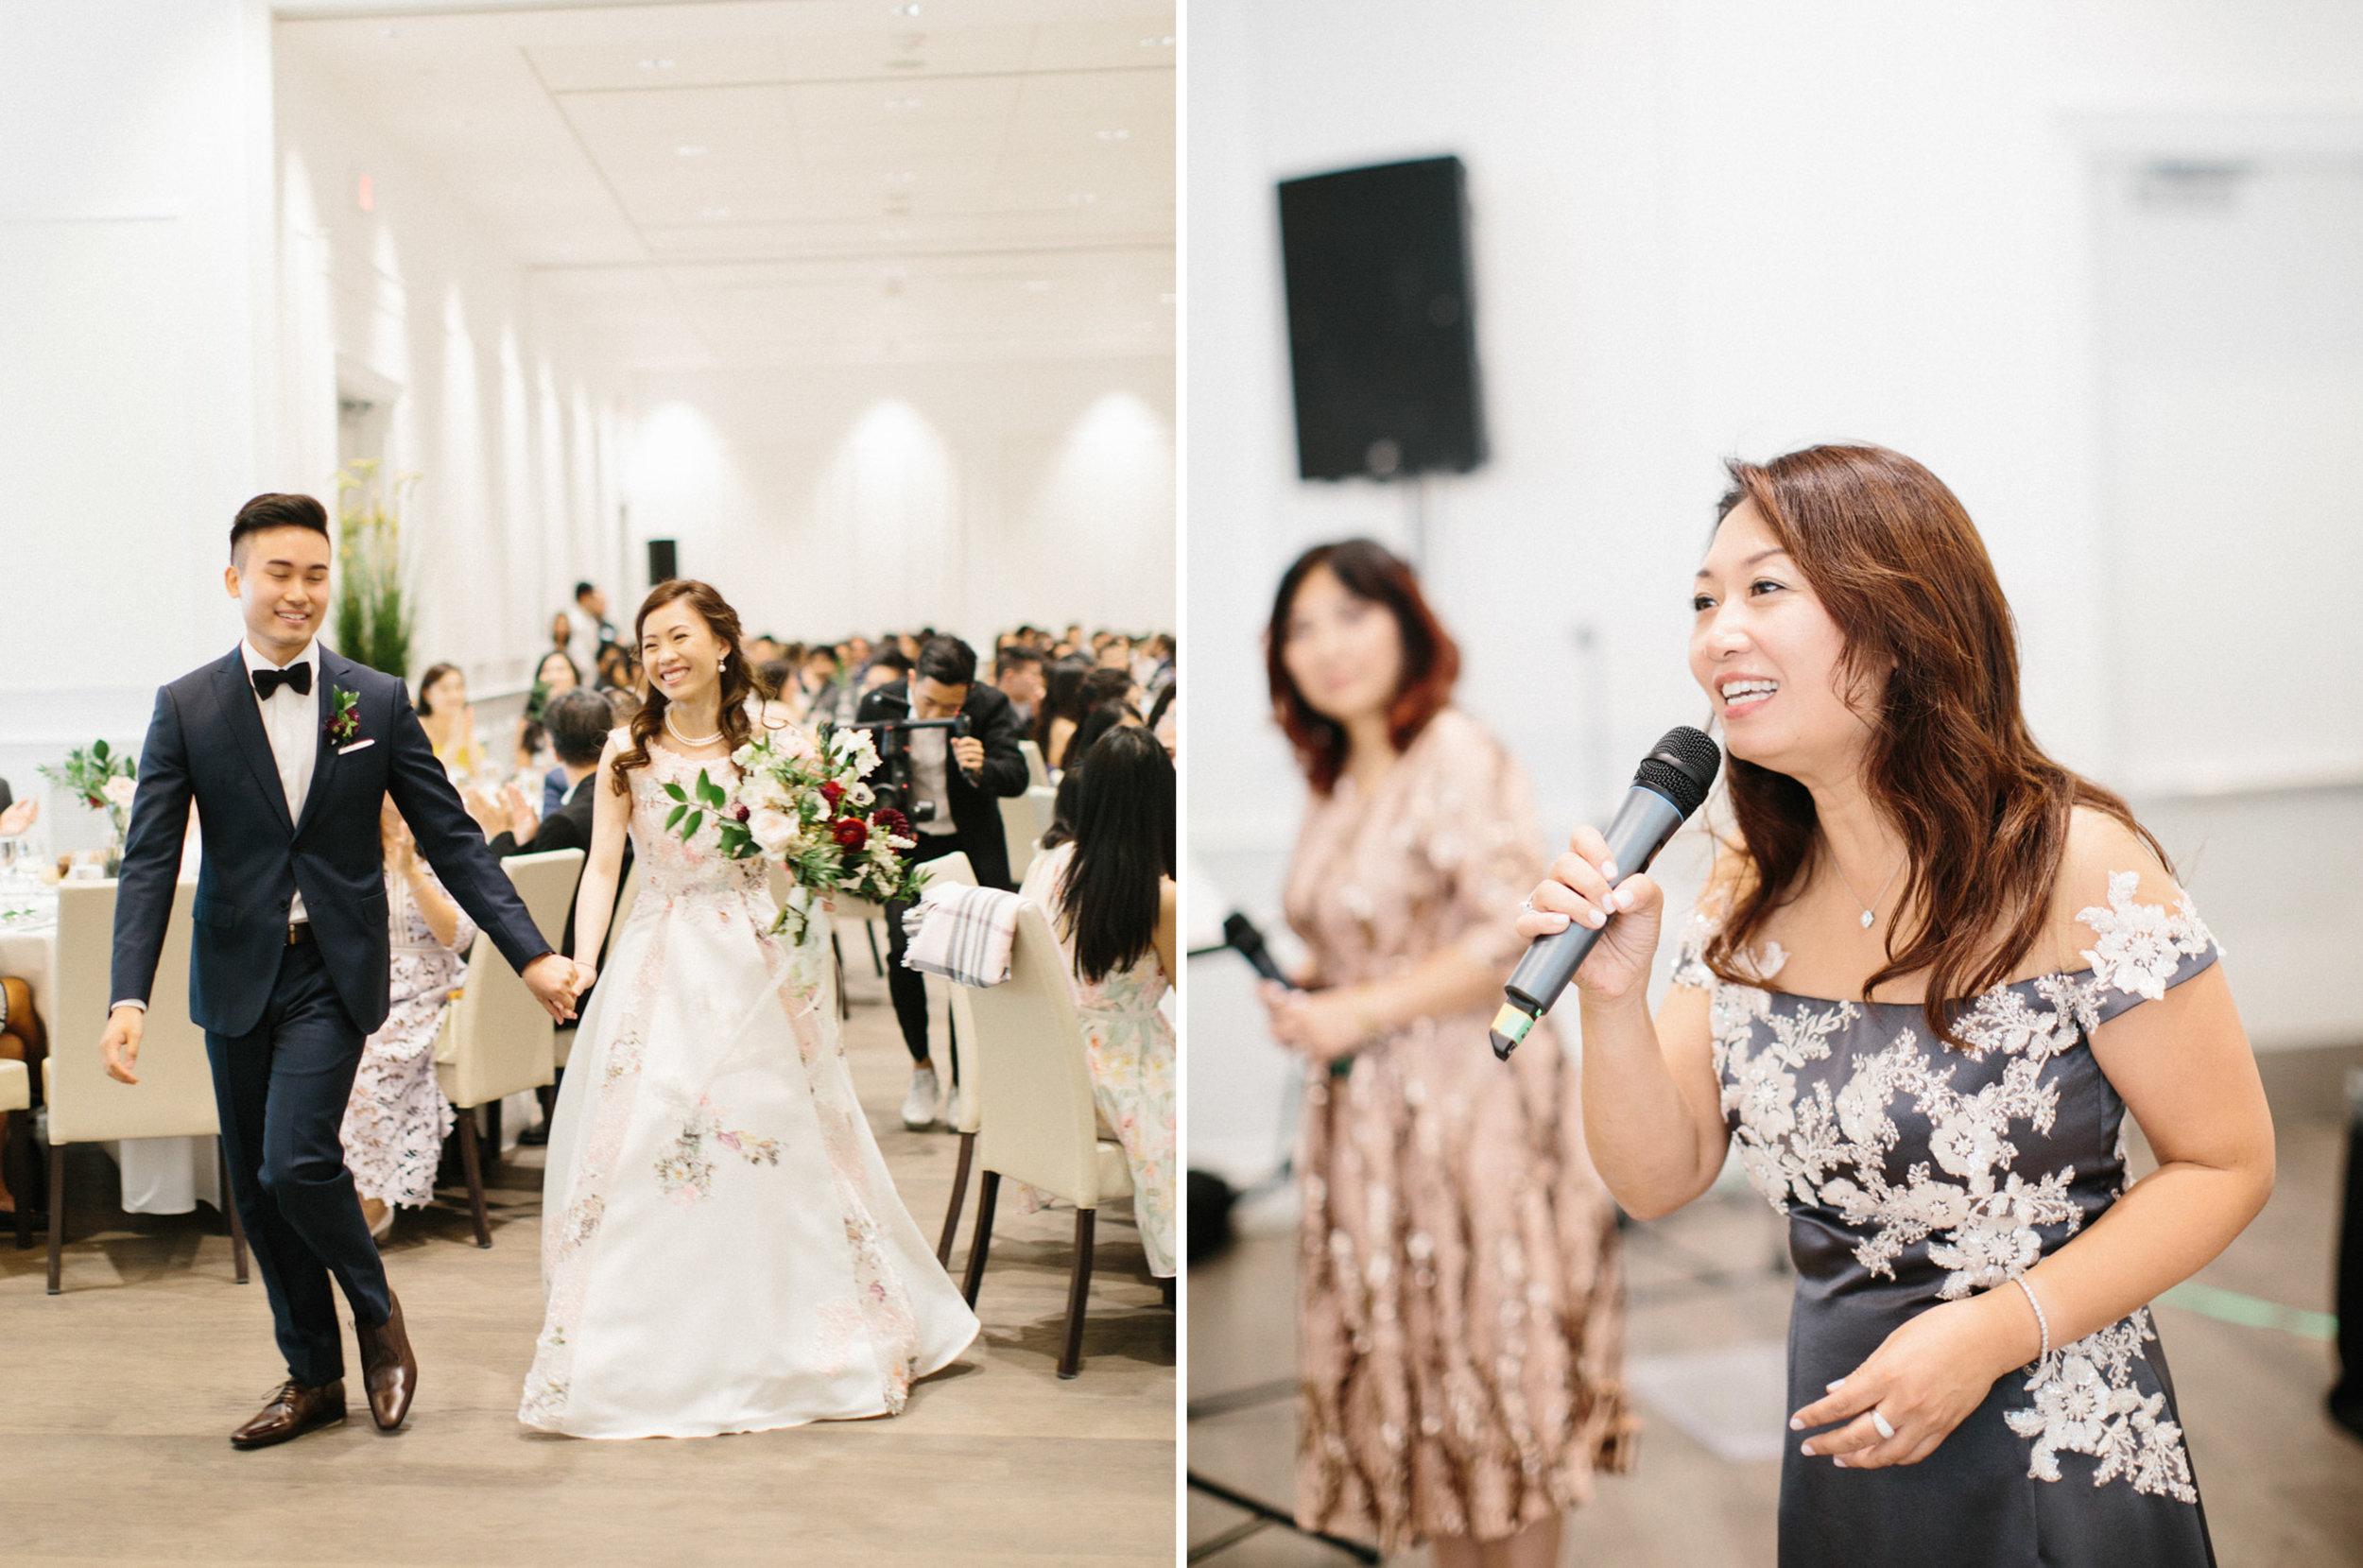 toronto_wedding_photographer_documentary_fine_art_photography20.jpg